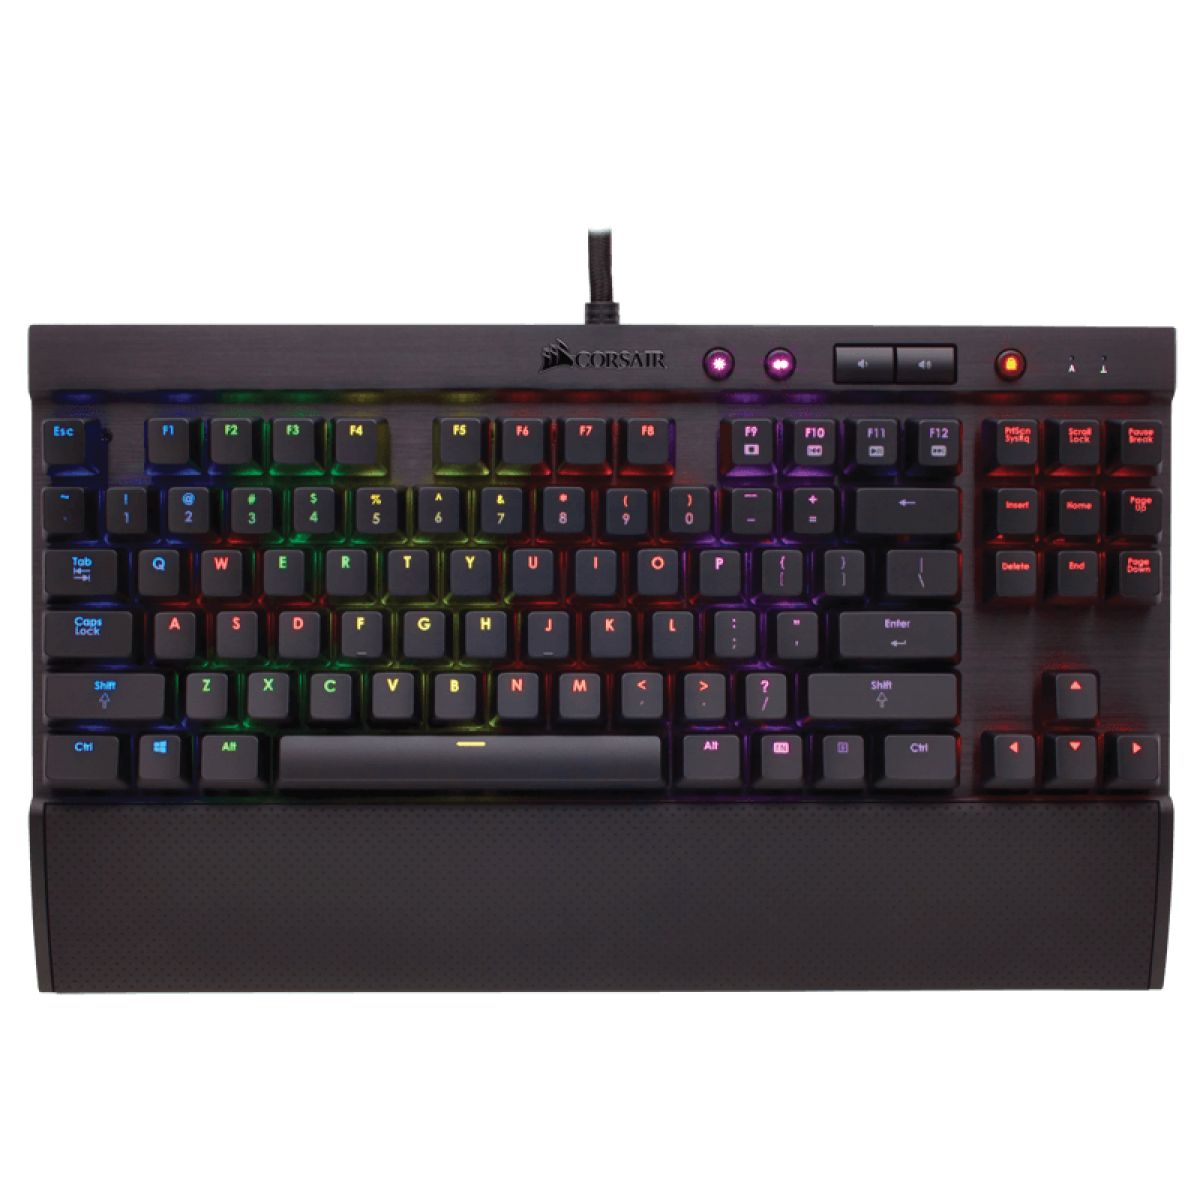 Teclado Mecânico Gamer Corsair K65 RGB Switch Cherry MX Red CH-9000222-BR ABNT2